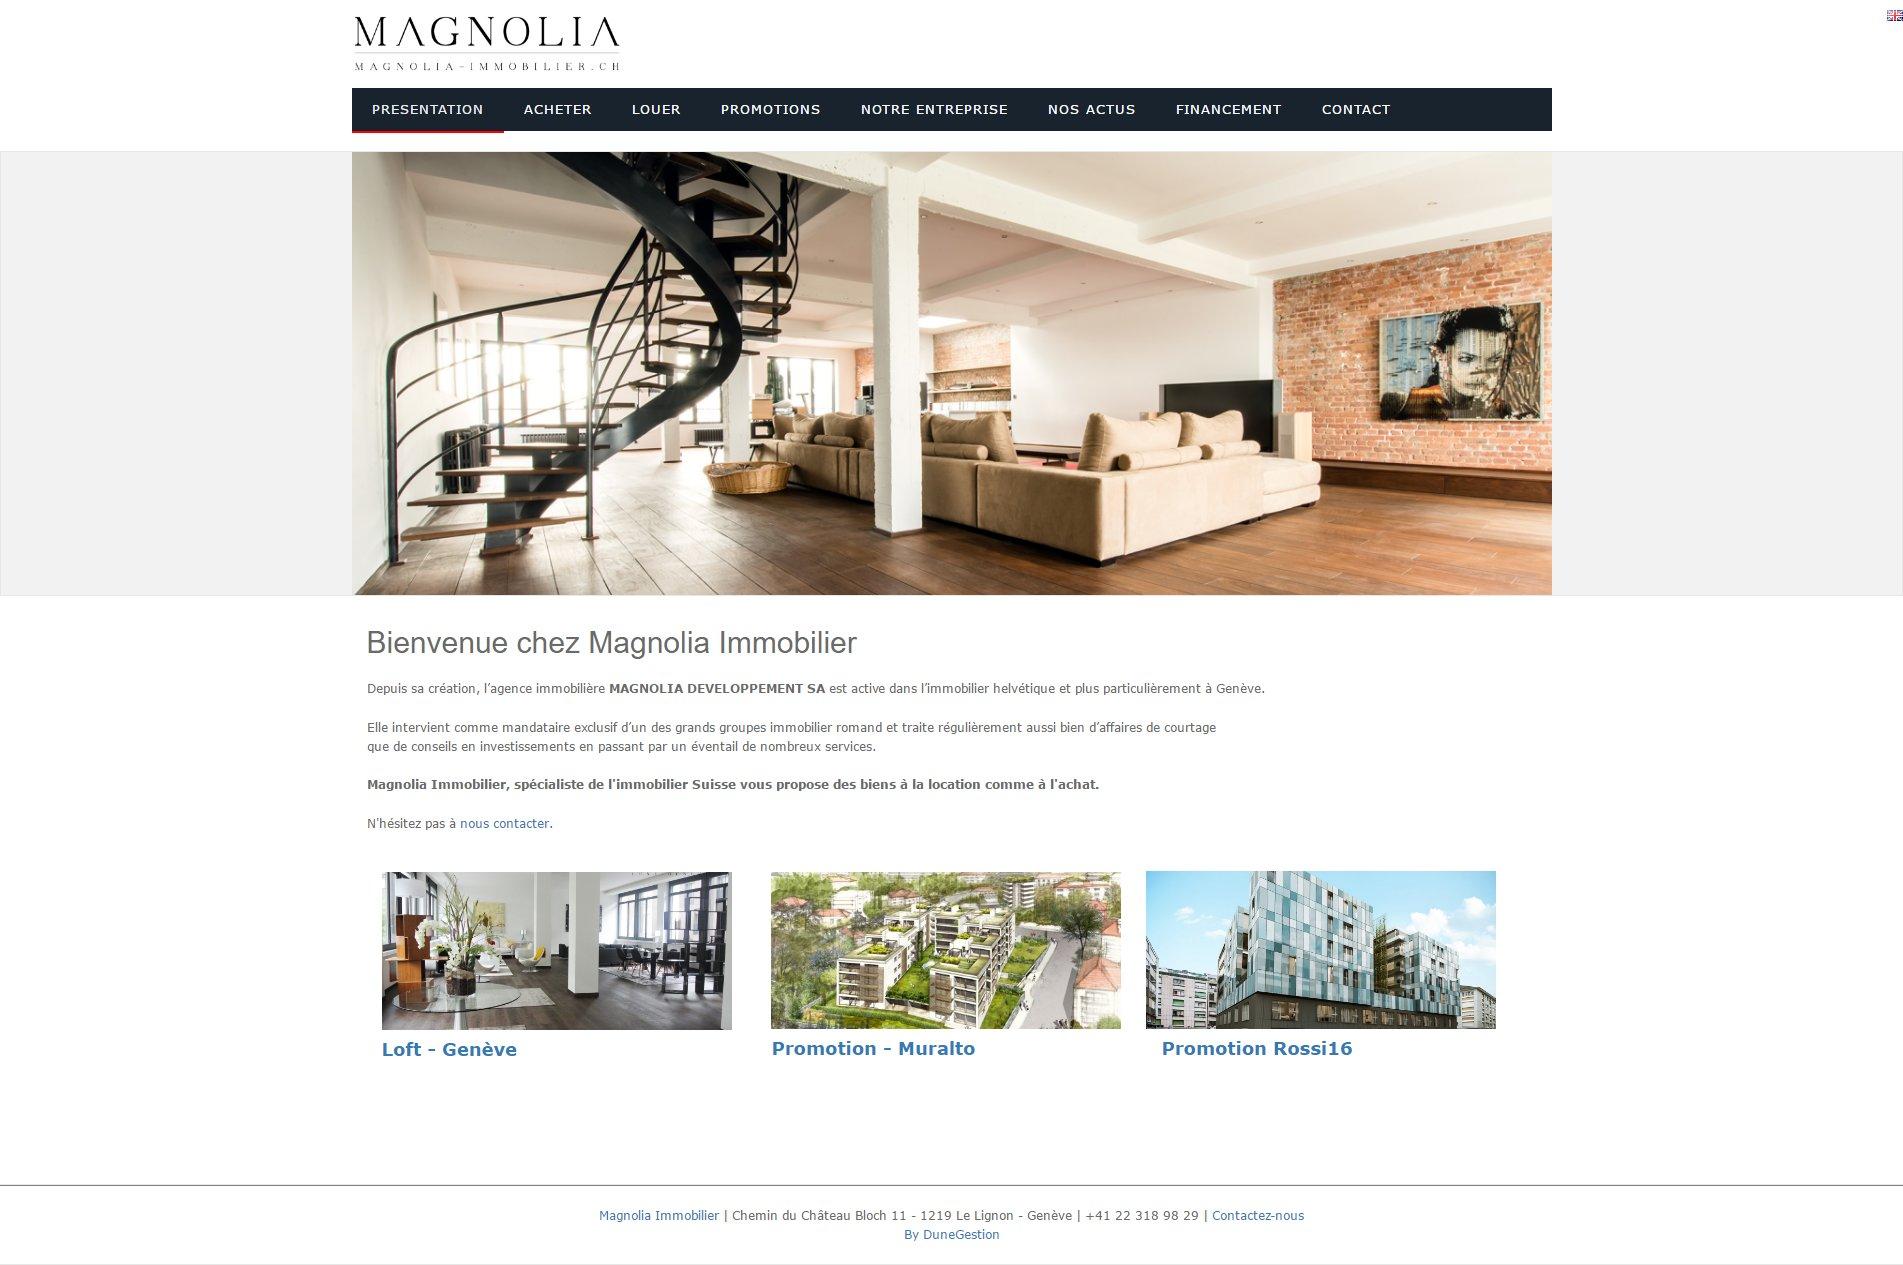 Magnolia Real Estate